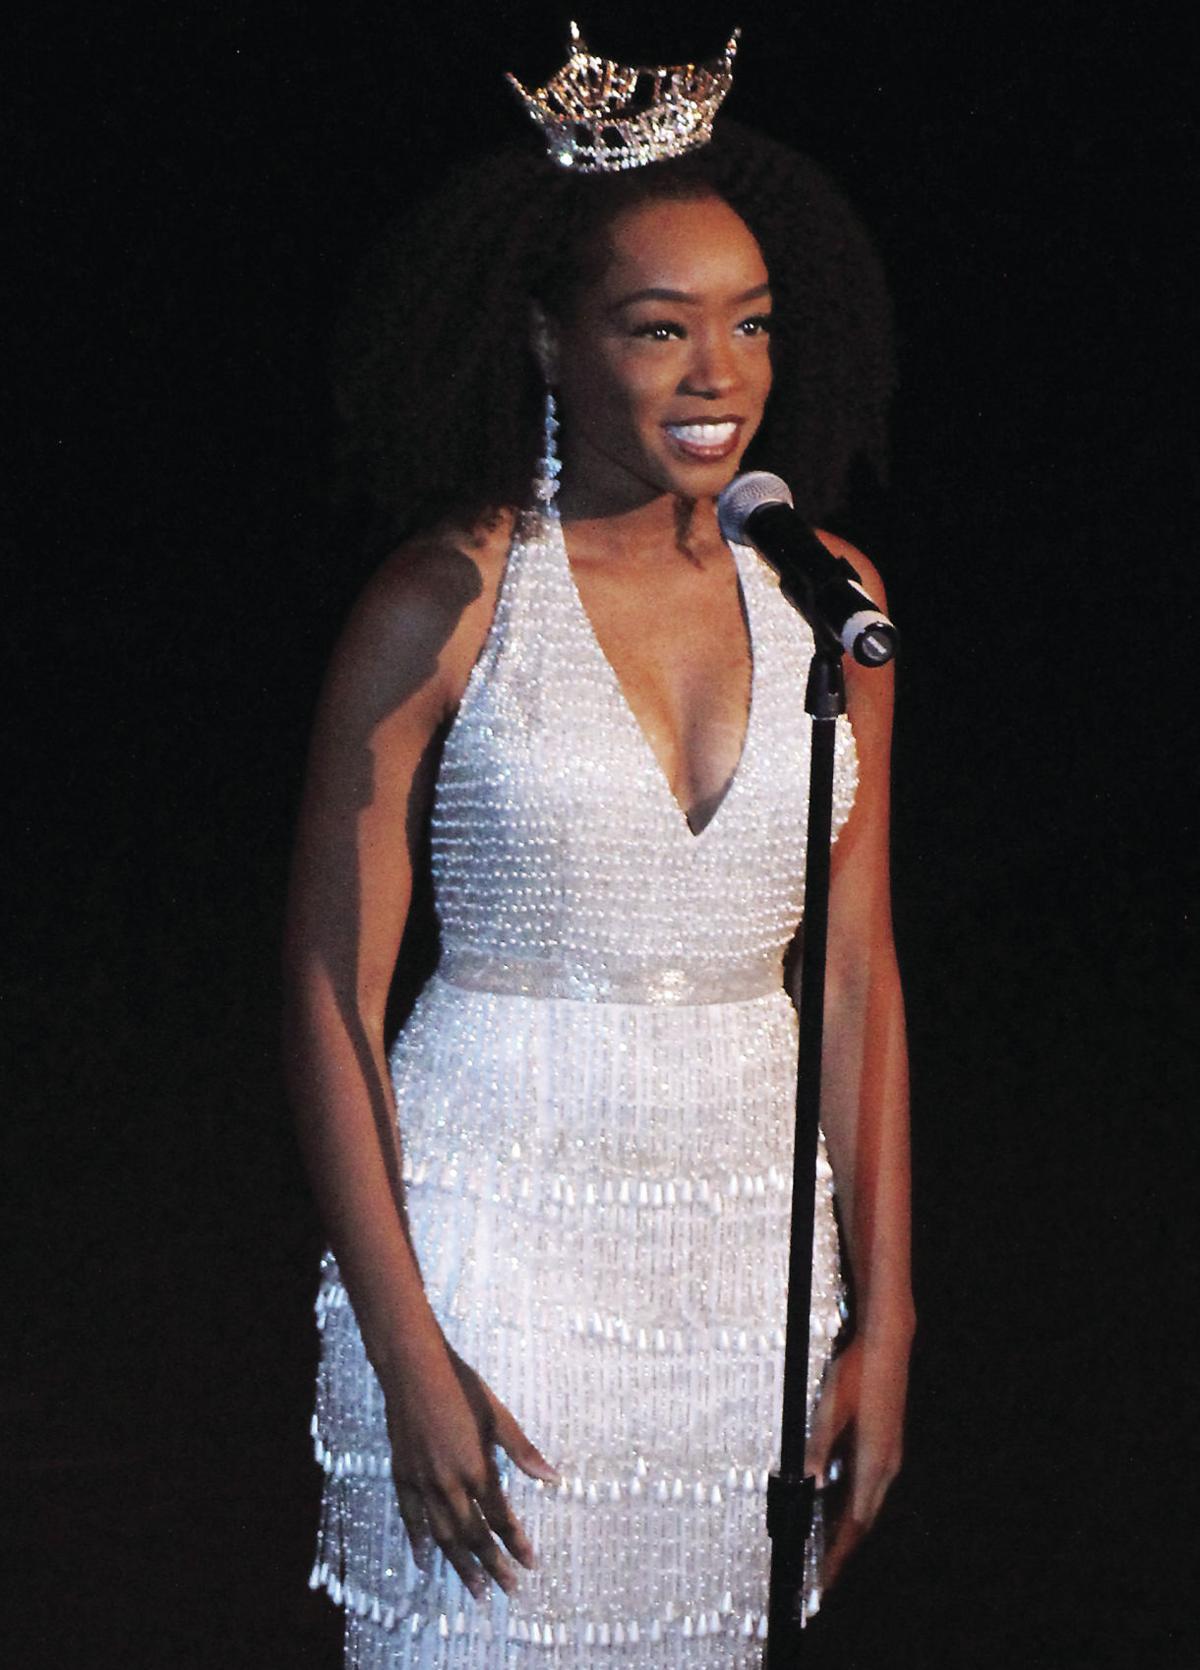 Tiarra Taylor's Impact on Miss America 2020